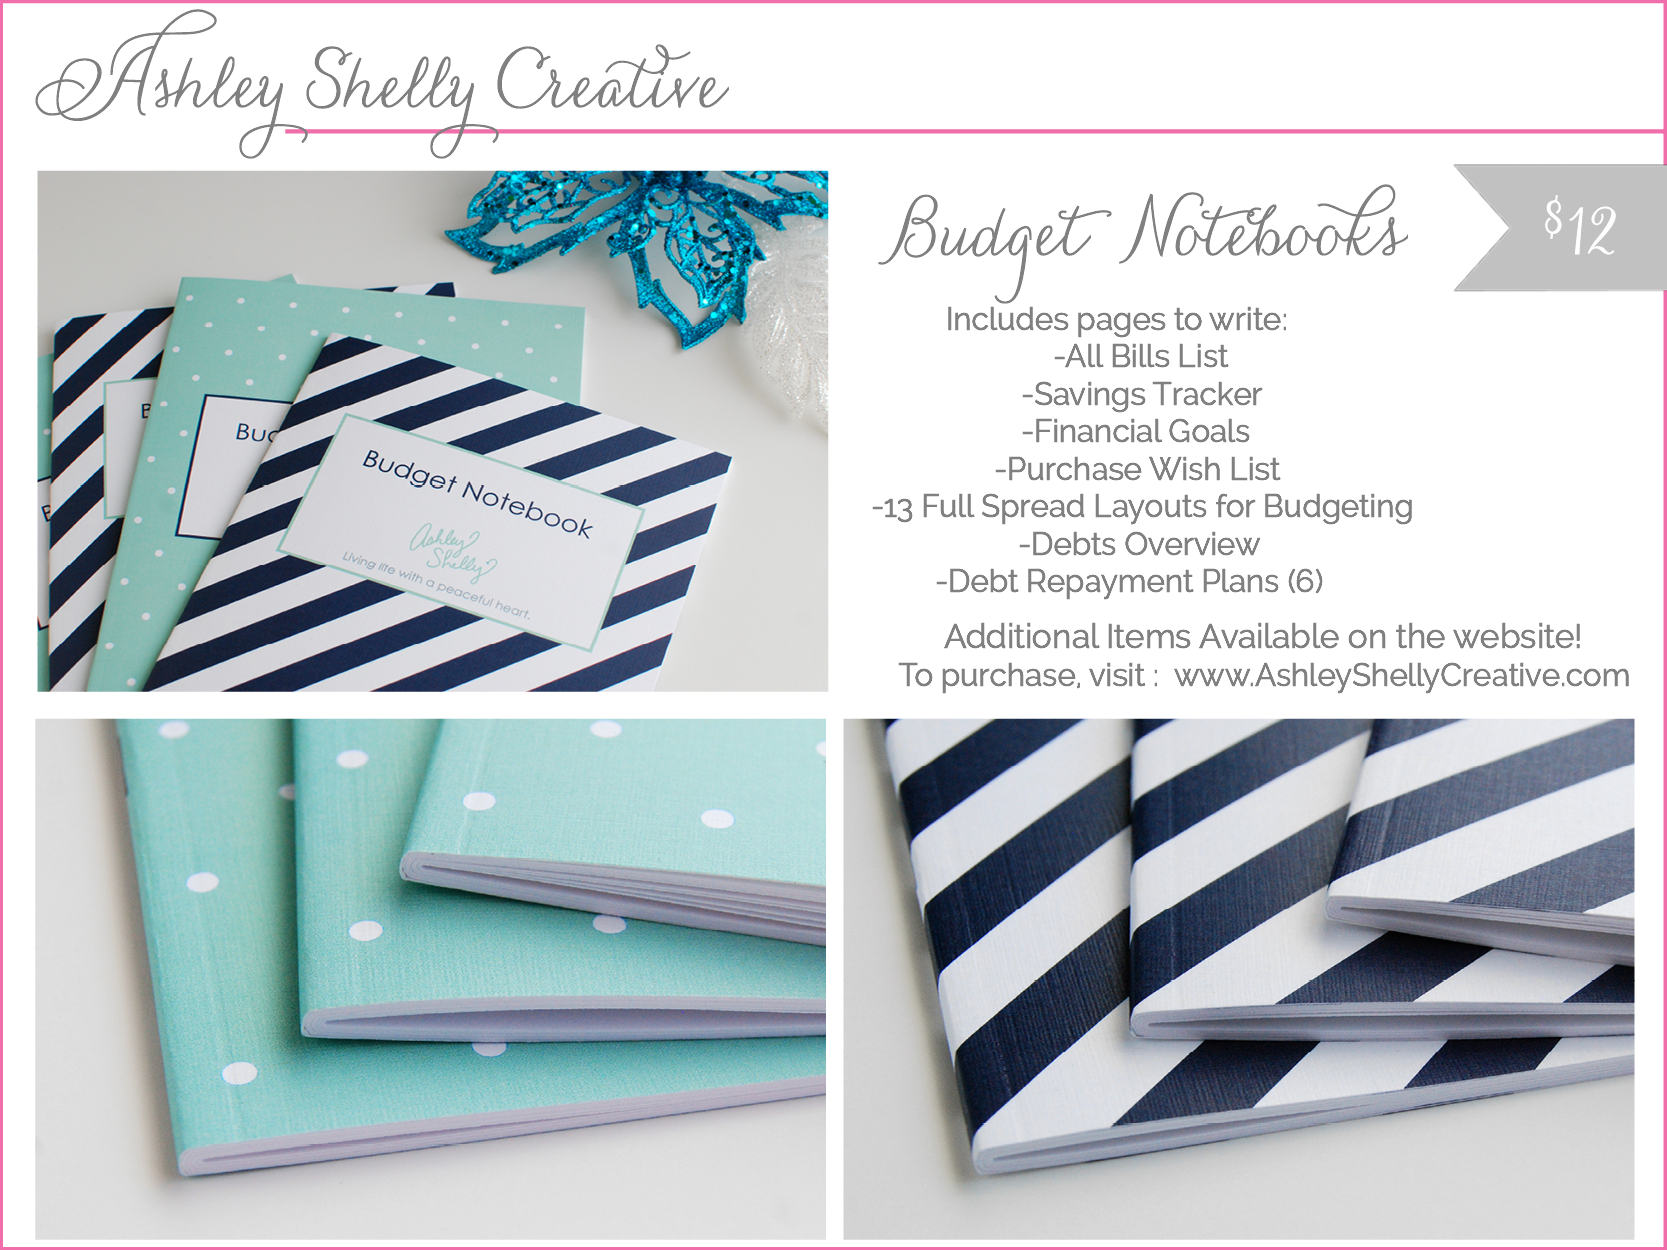 ashley shelly creative - budget notebooks - shop small